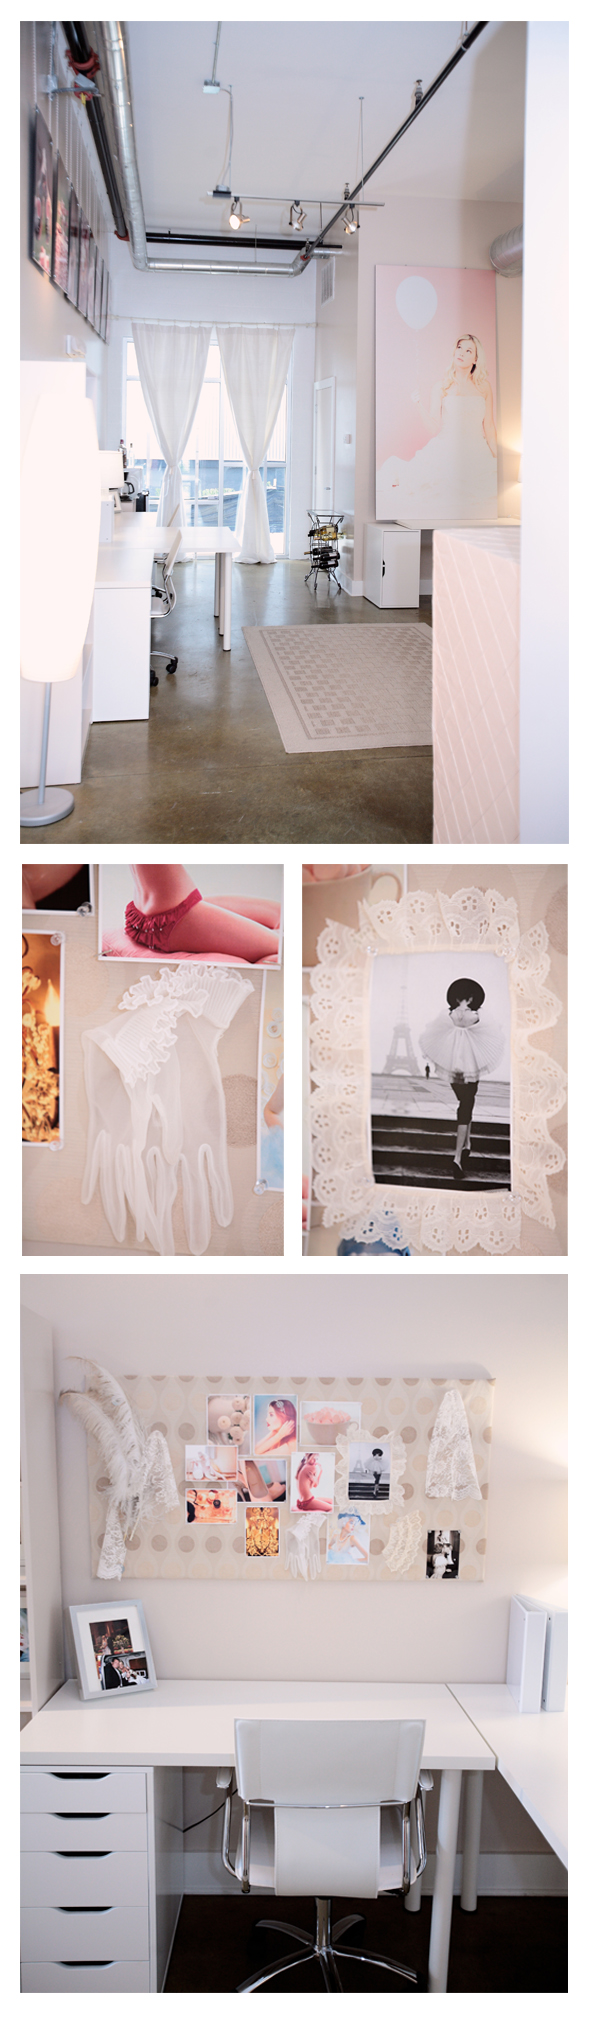 Photography-Studio-Decor-Inspiration.jpg